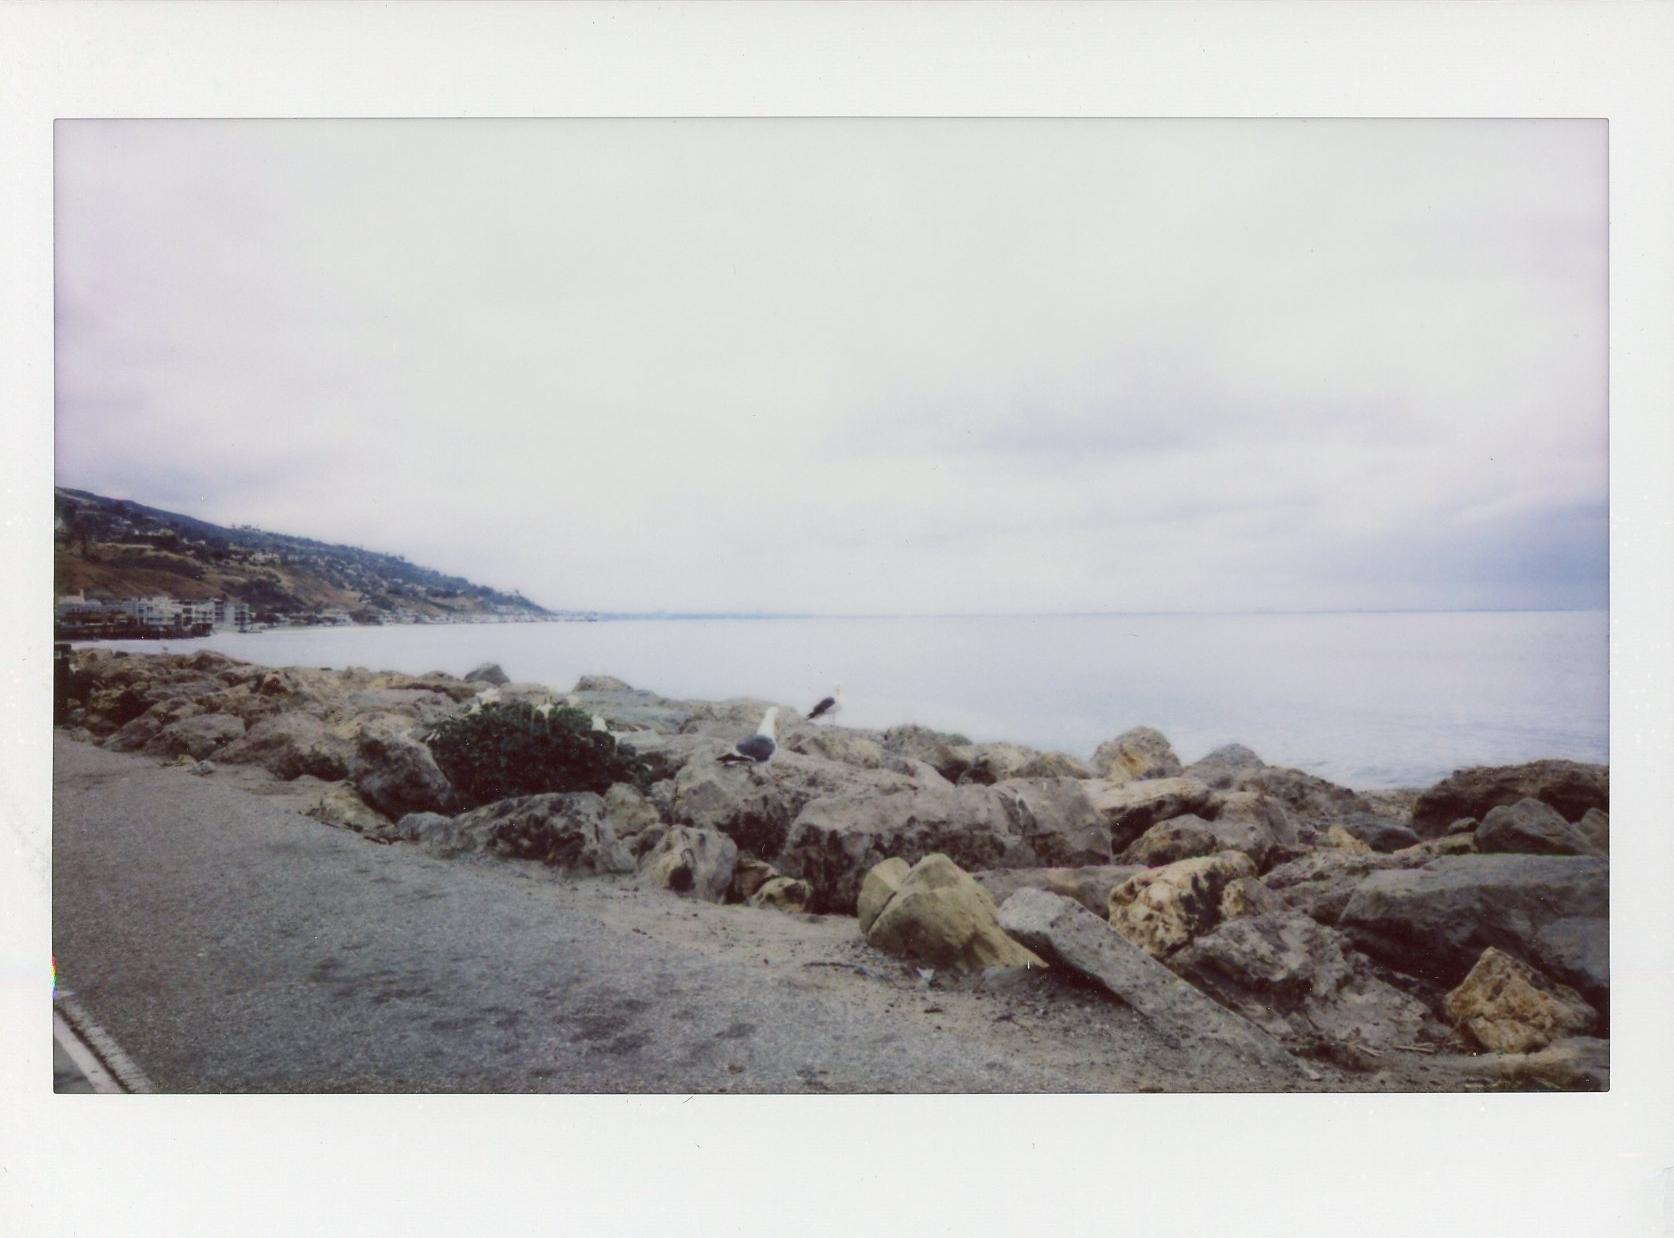 Malibu polaroid Rachel Hanon Photography 1